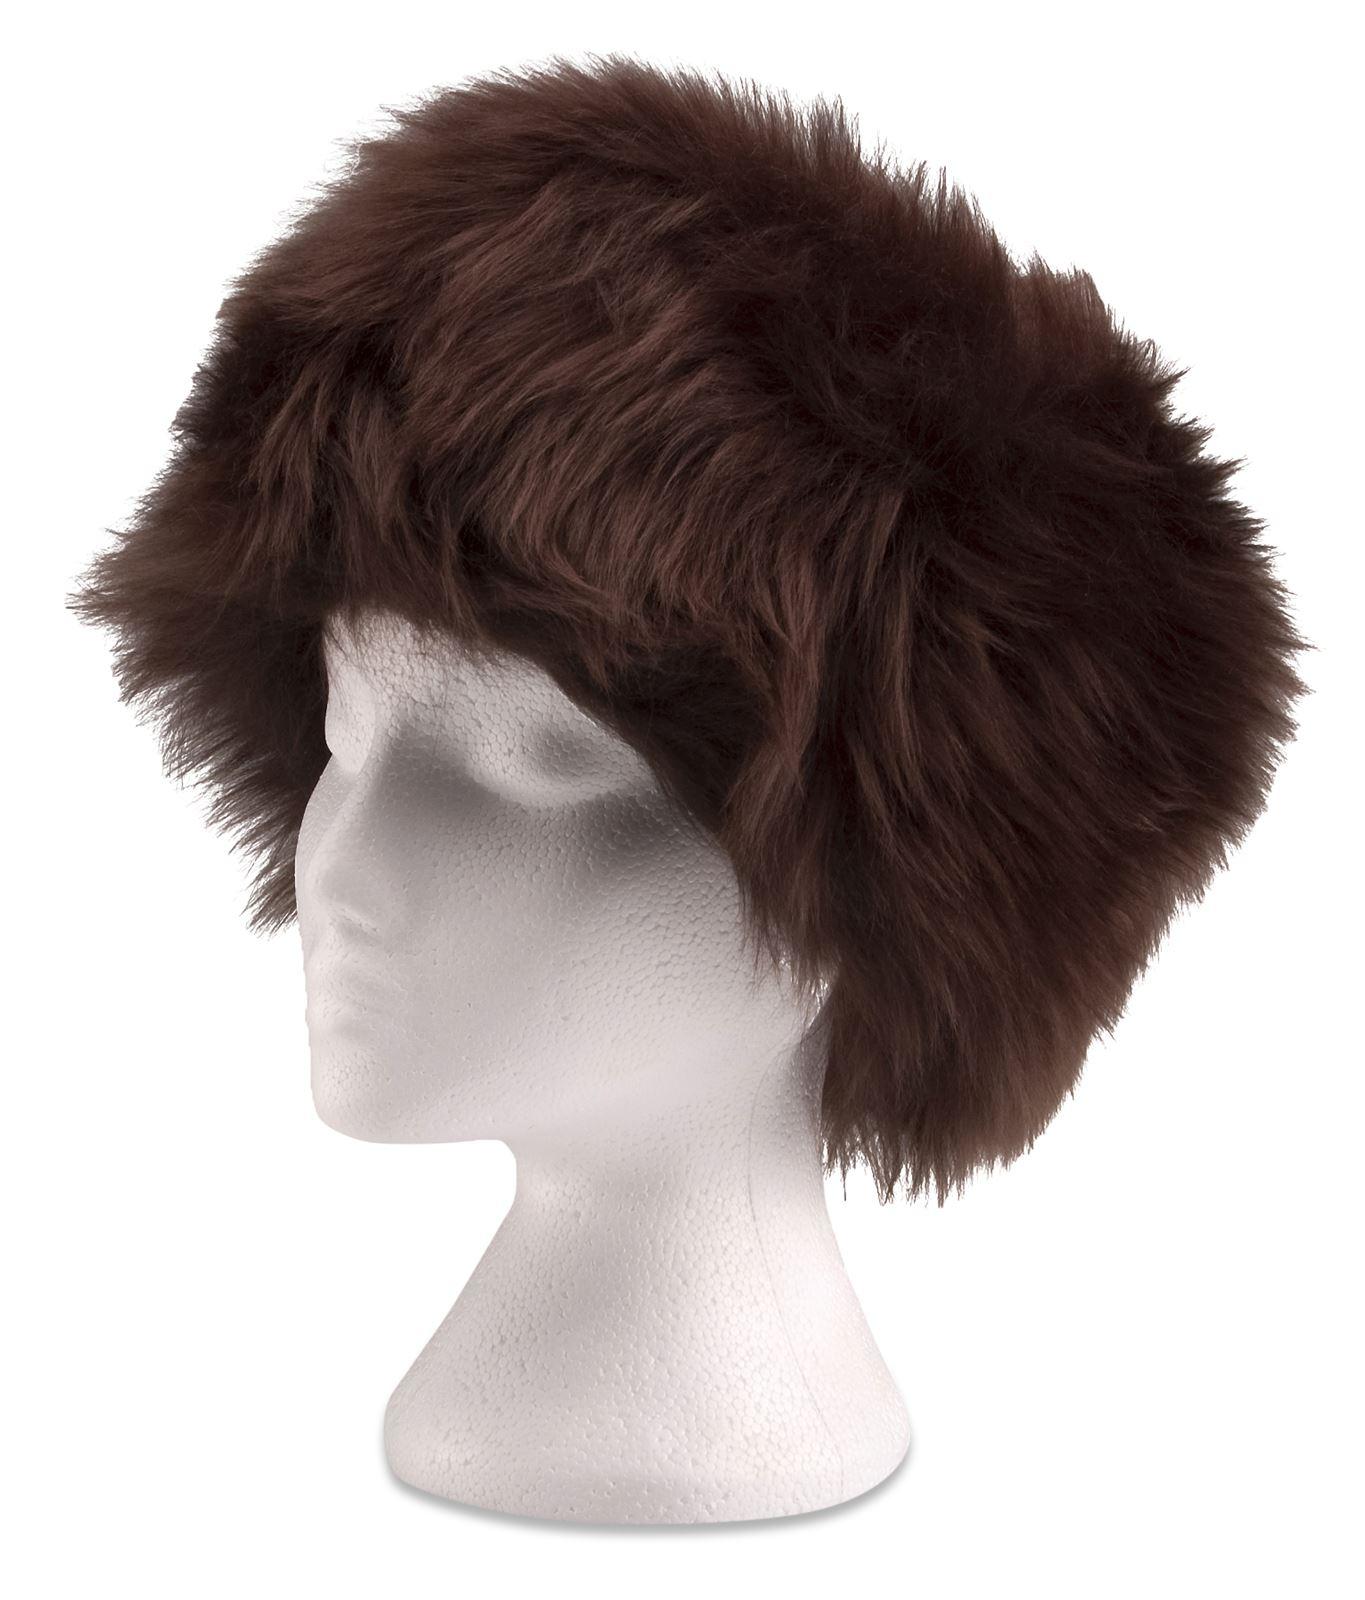 Ladies //Womens Genuine Sheepskin Hat Russian Cossack style Black Brown Natural